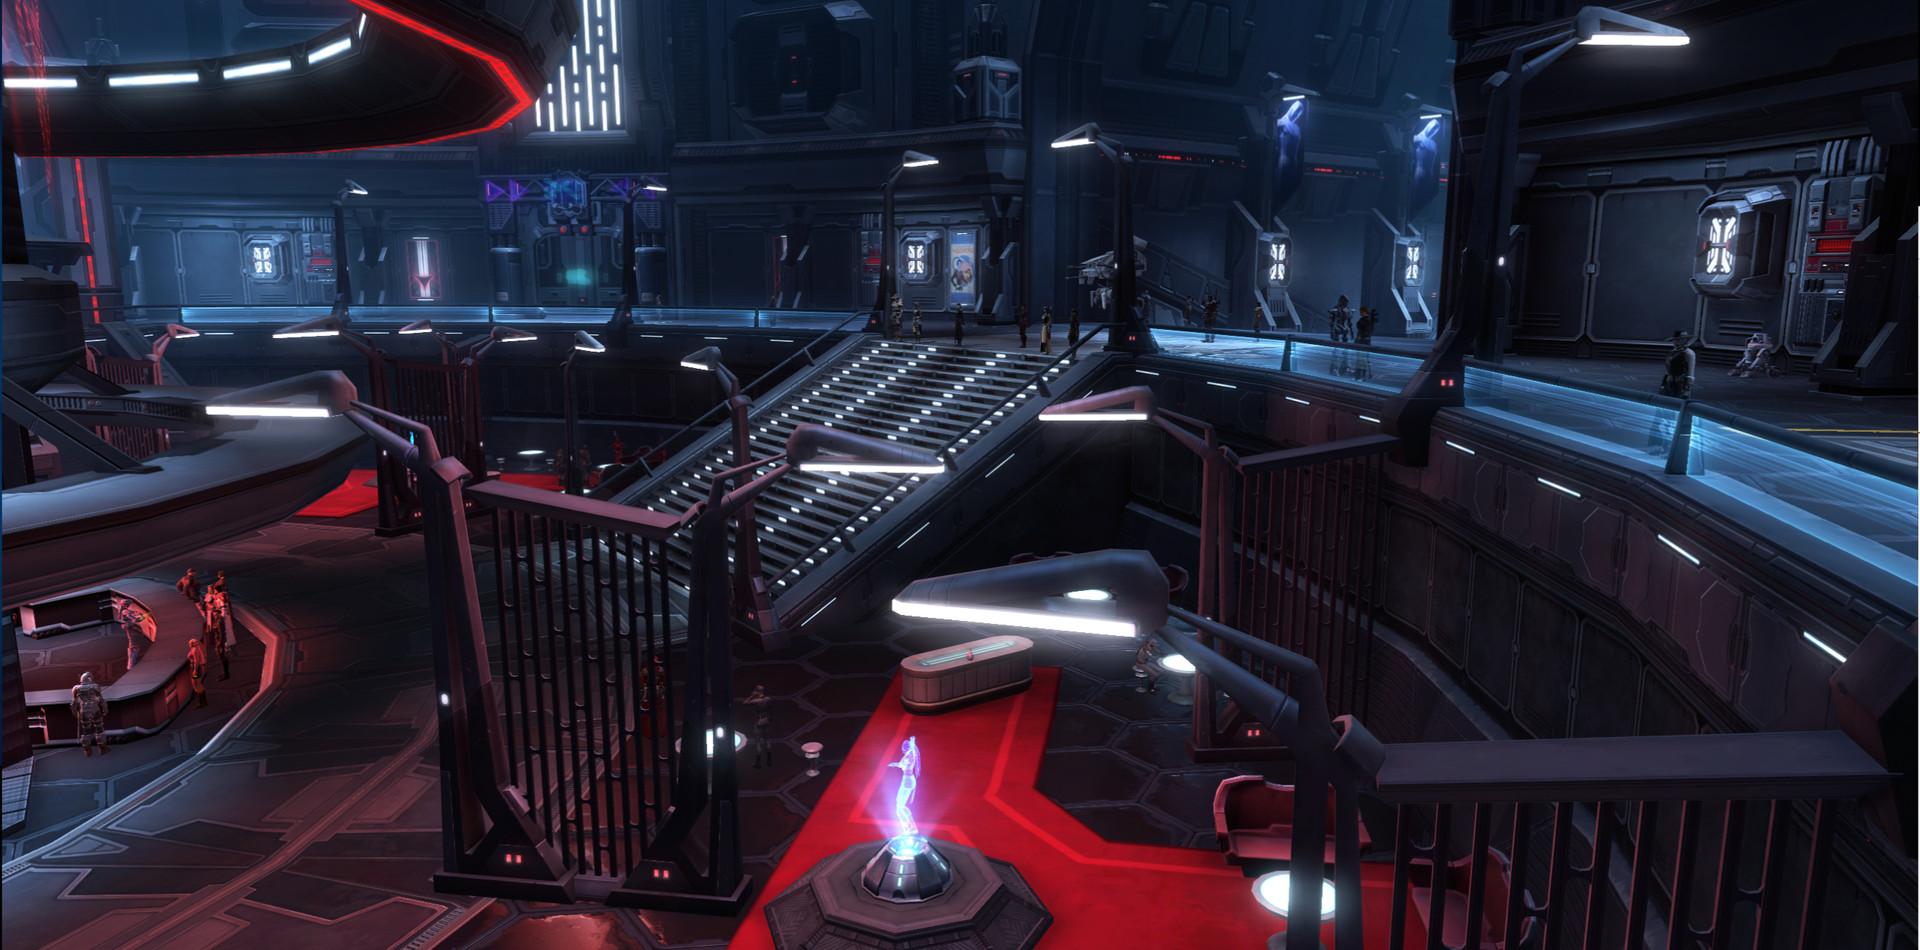 Empire Station - Central Hub